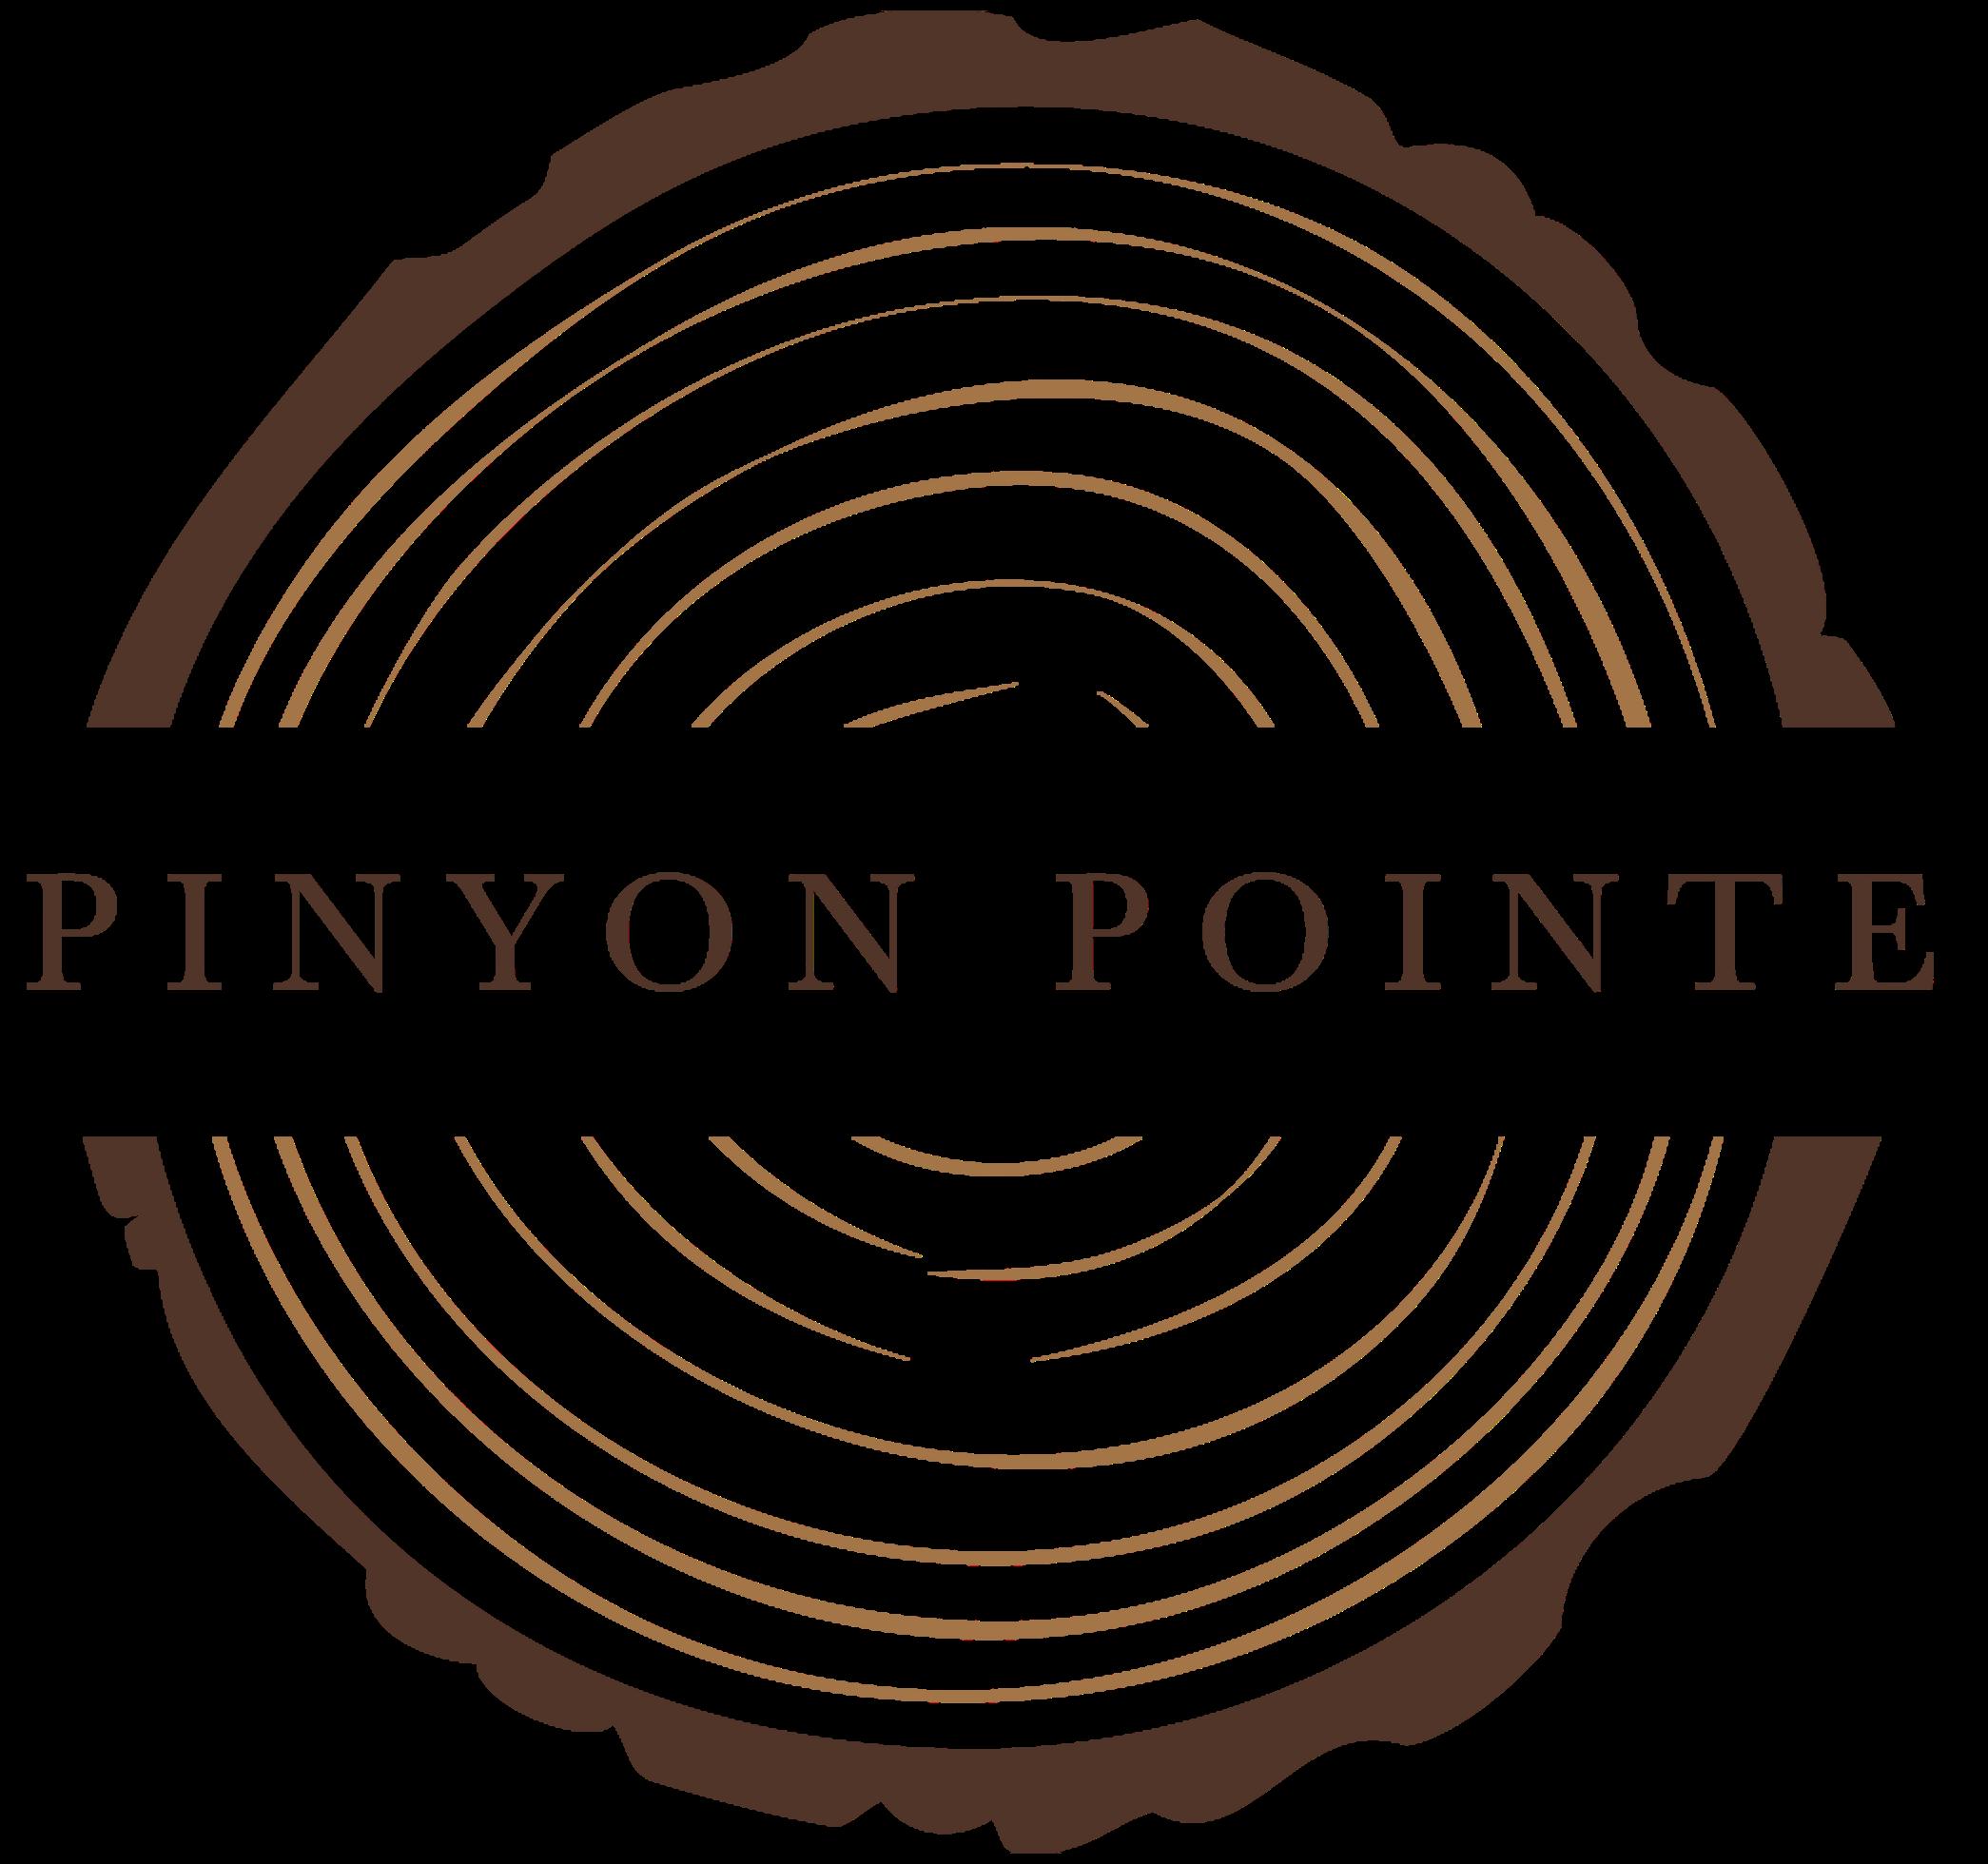 Pinyon Pointe, Loveland, CO